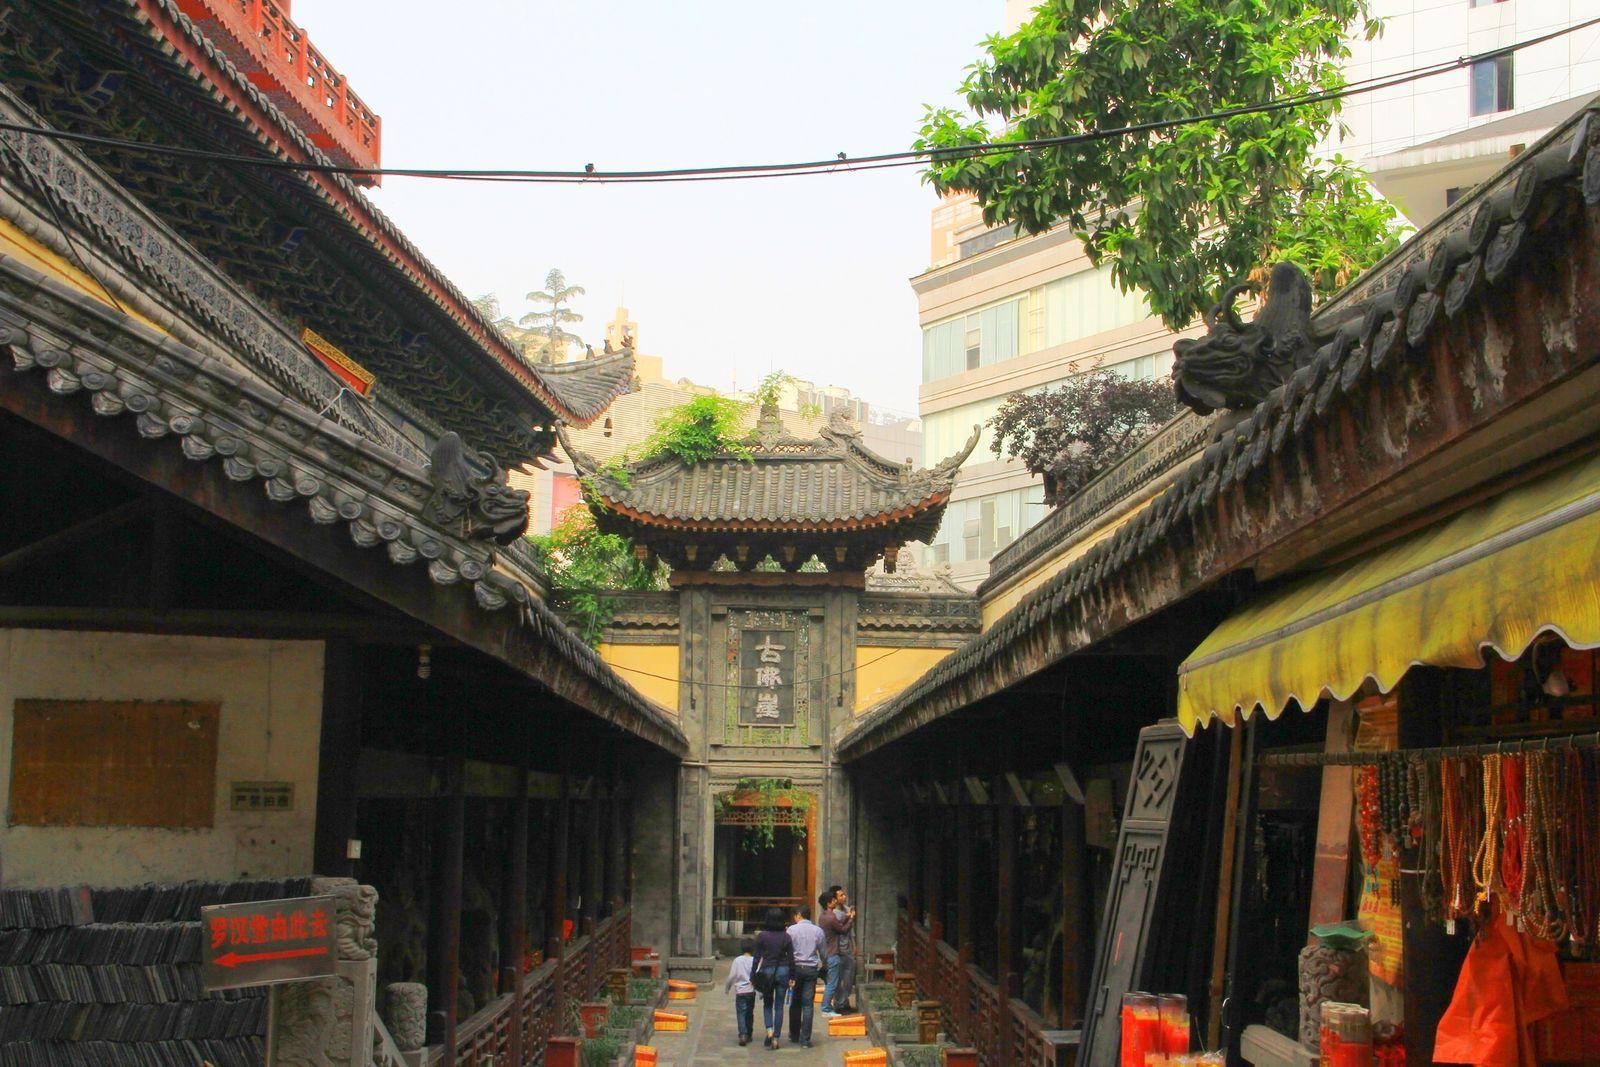 Le temple des arhats (罗汉寺).